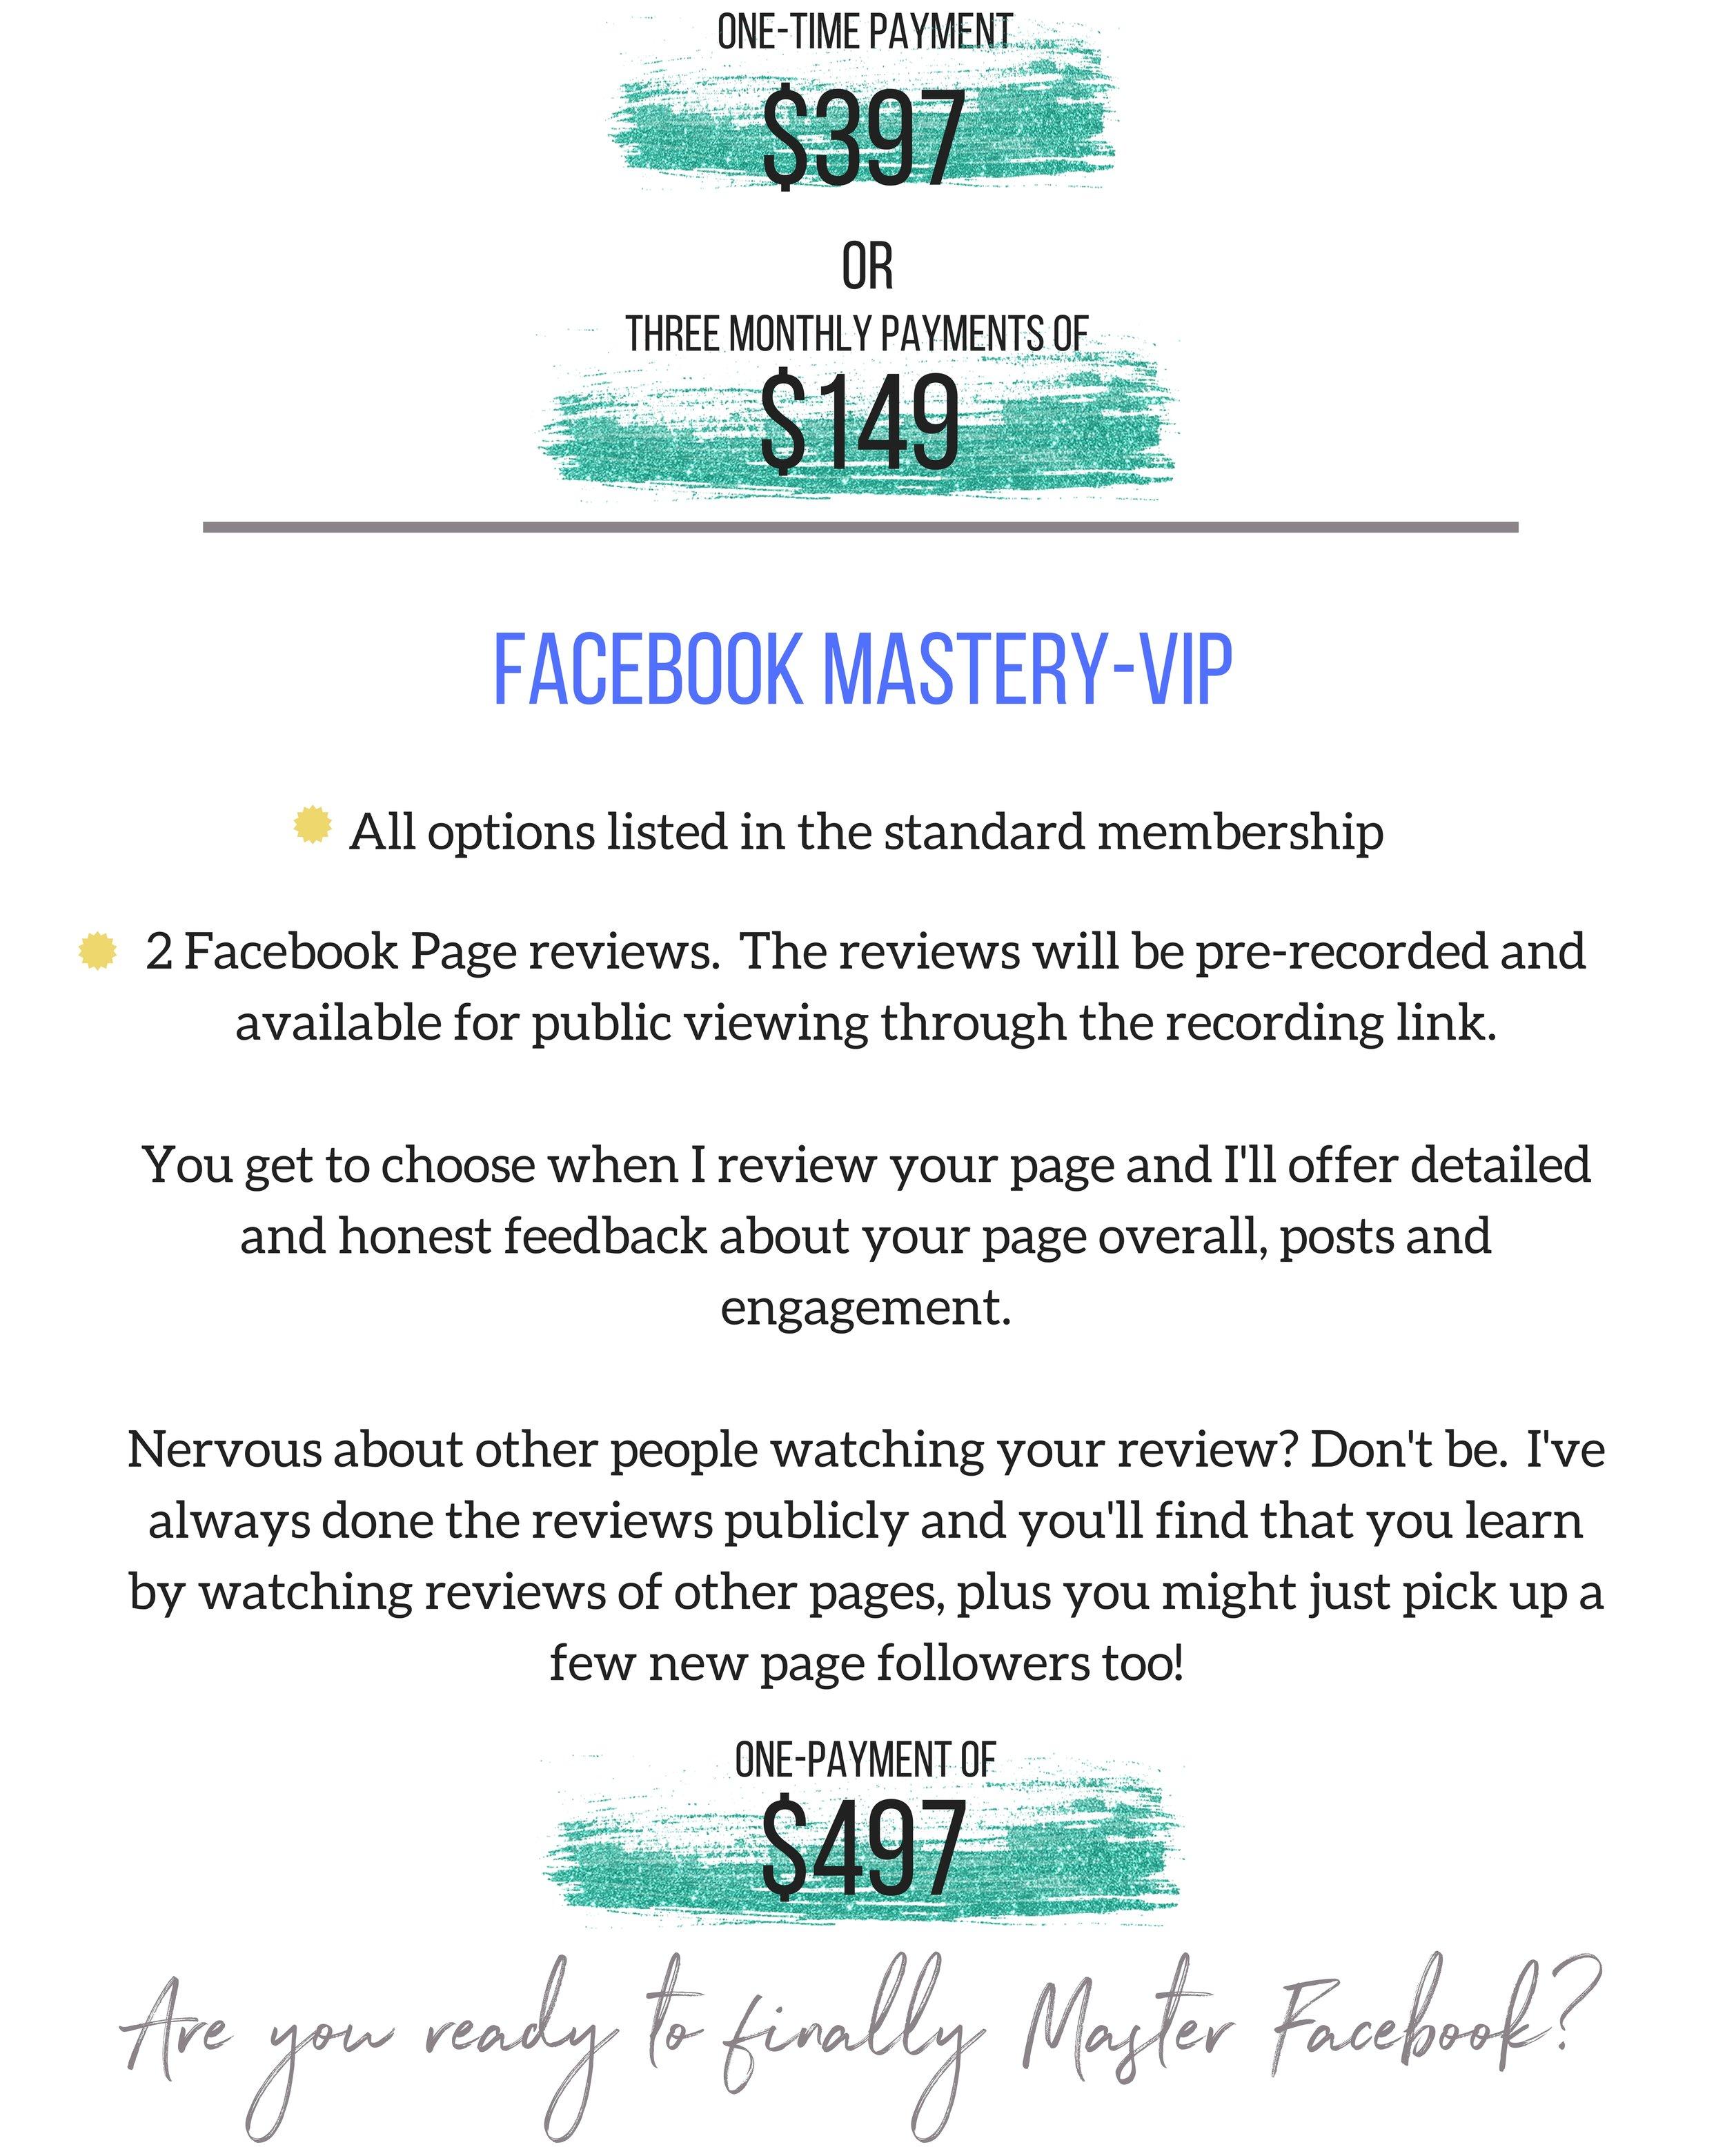 FB Mastery Sales Page-Short Form.jpg